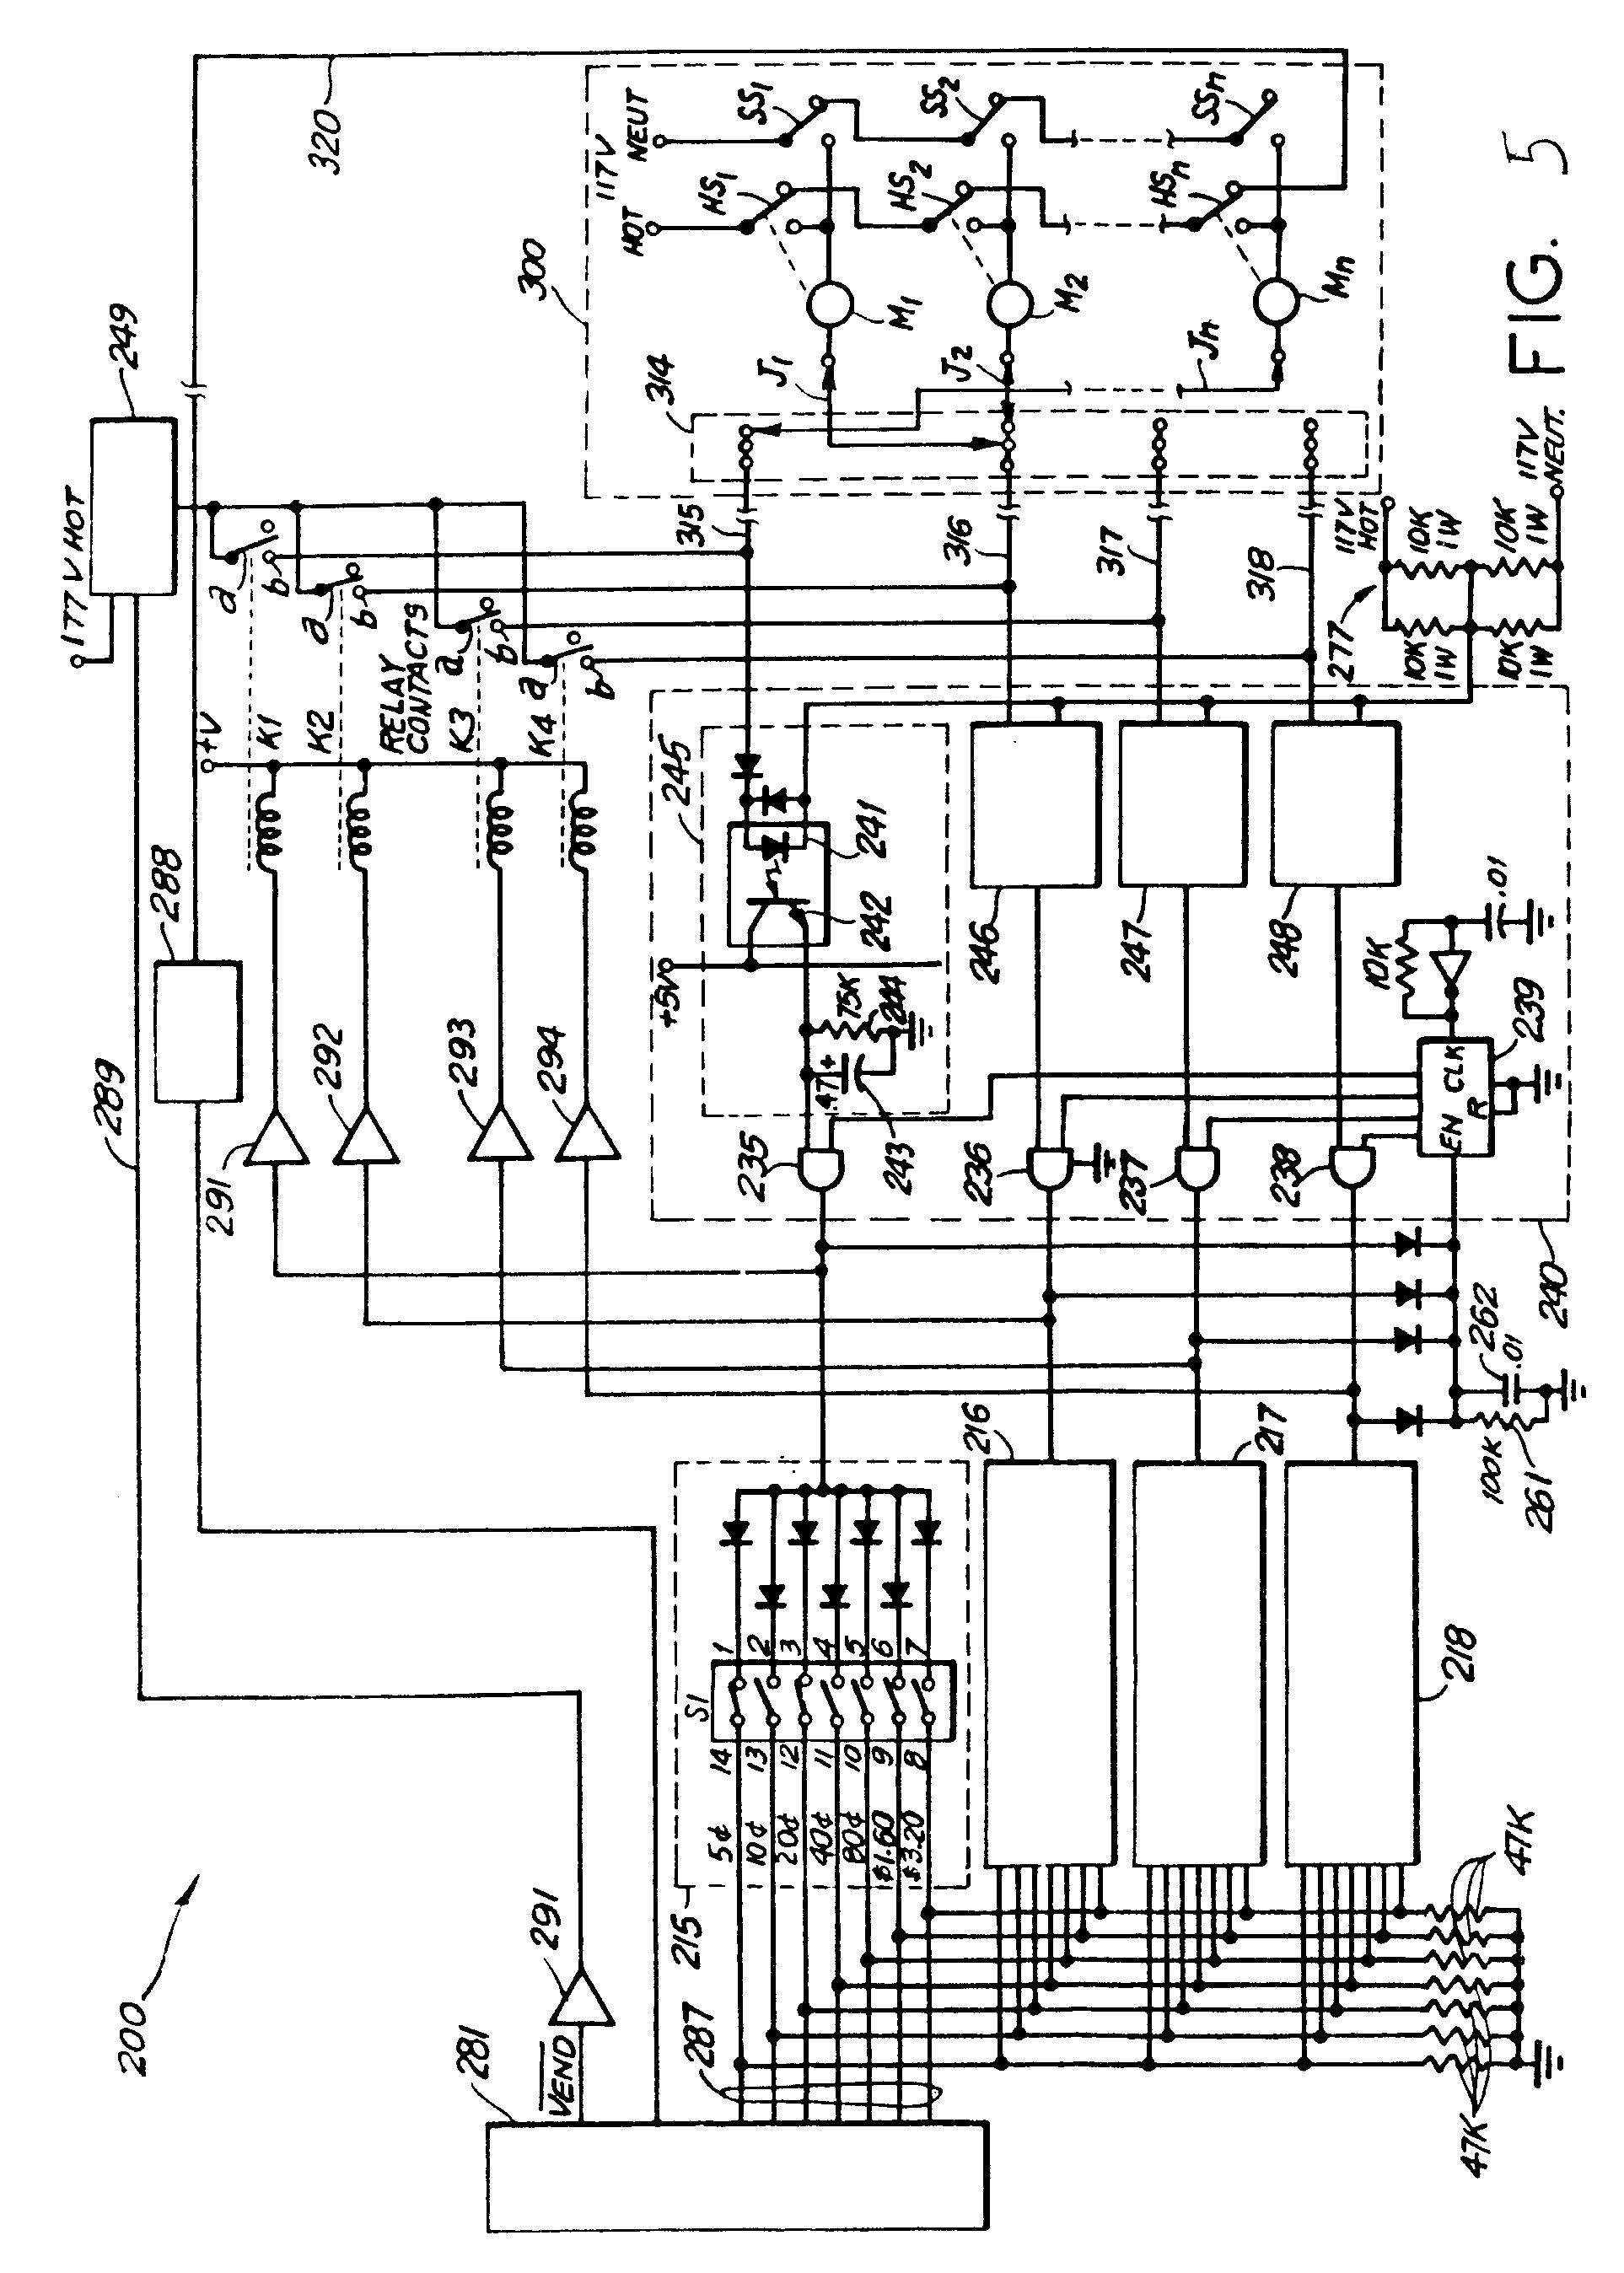 Narco Com 11 Wiring Diagram